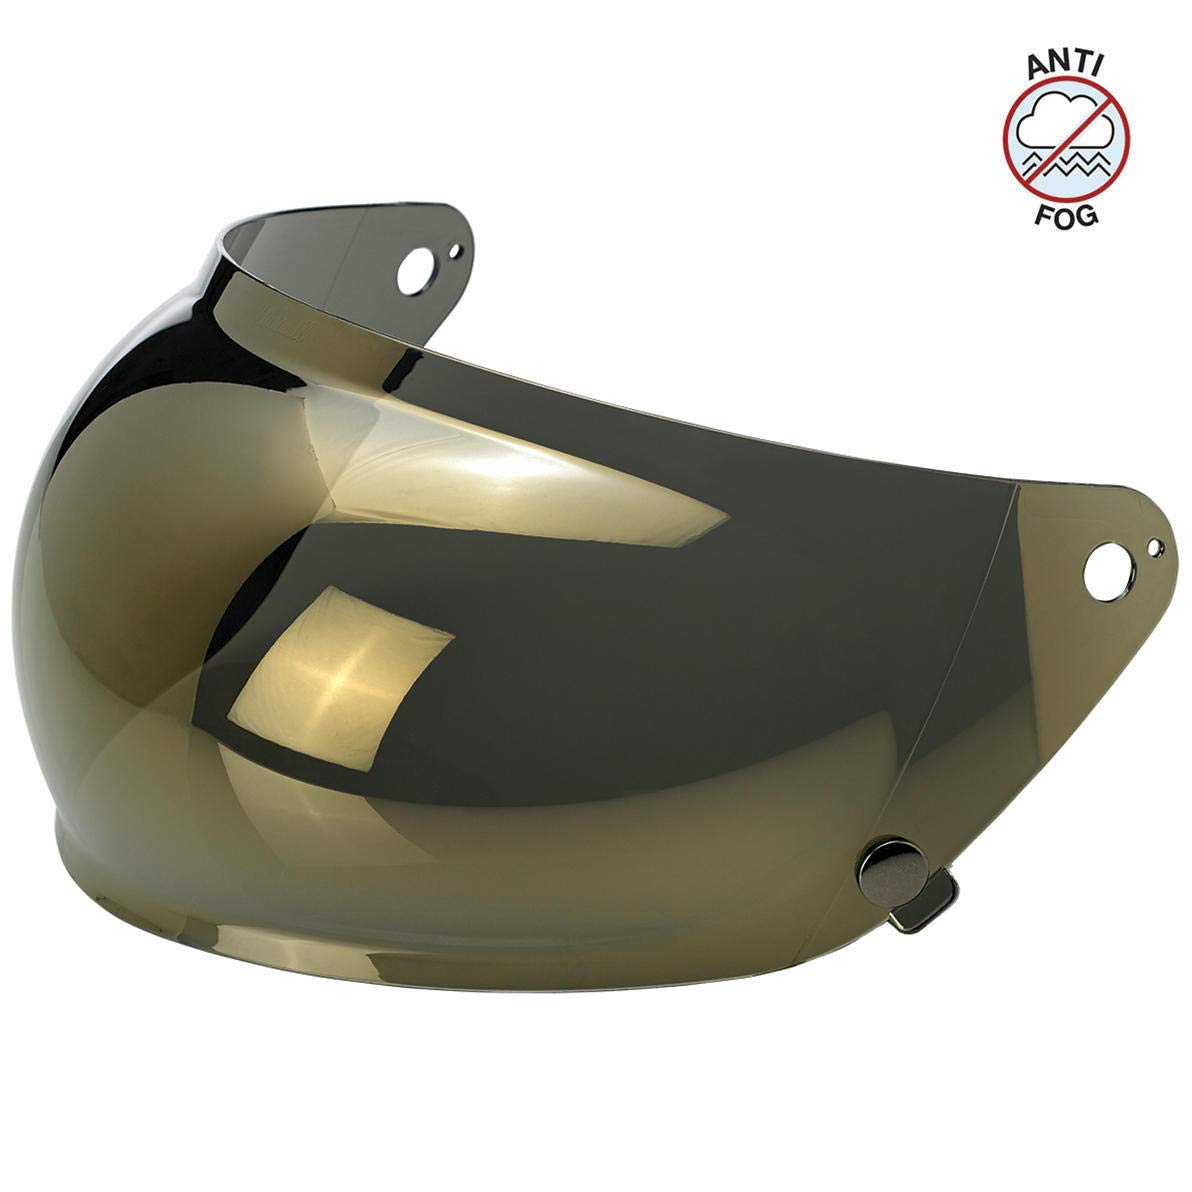 Biltwell Unisex-Adult's (BA-GLD-GS-SD) Gringo S Bubble Shield - Gold Mirror Anti-Fog, One Size,